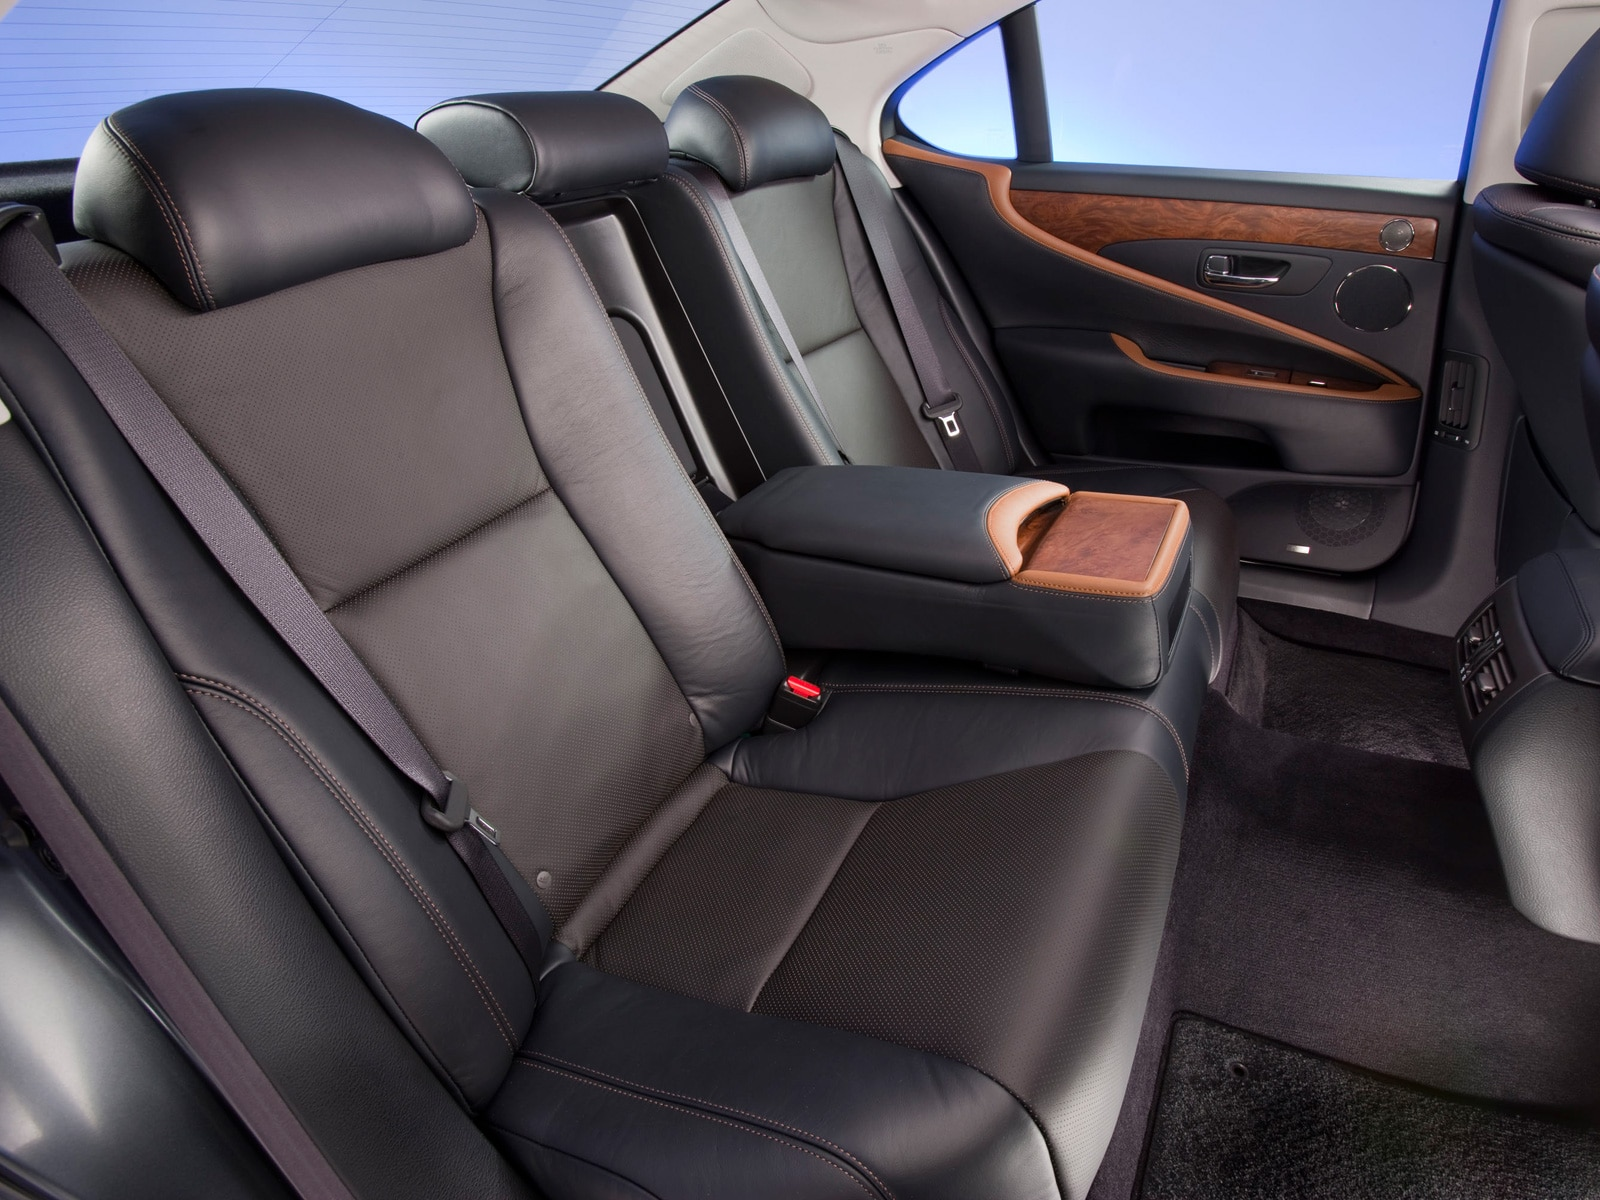 https://st.automobilemag.com/uploads/sites/11/2009/11/0911_11_z-2010_lexus_lS_460_sport-rear_interior.jpg